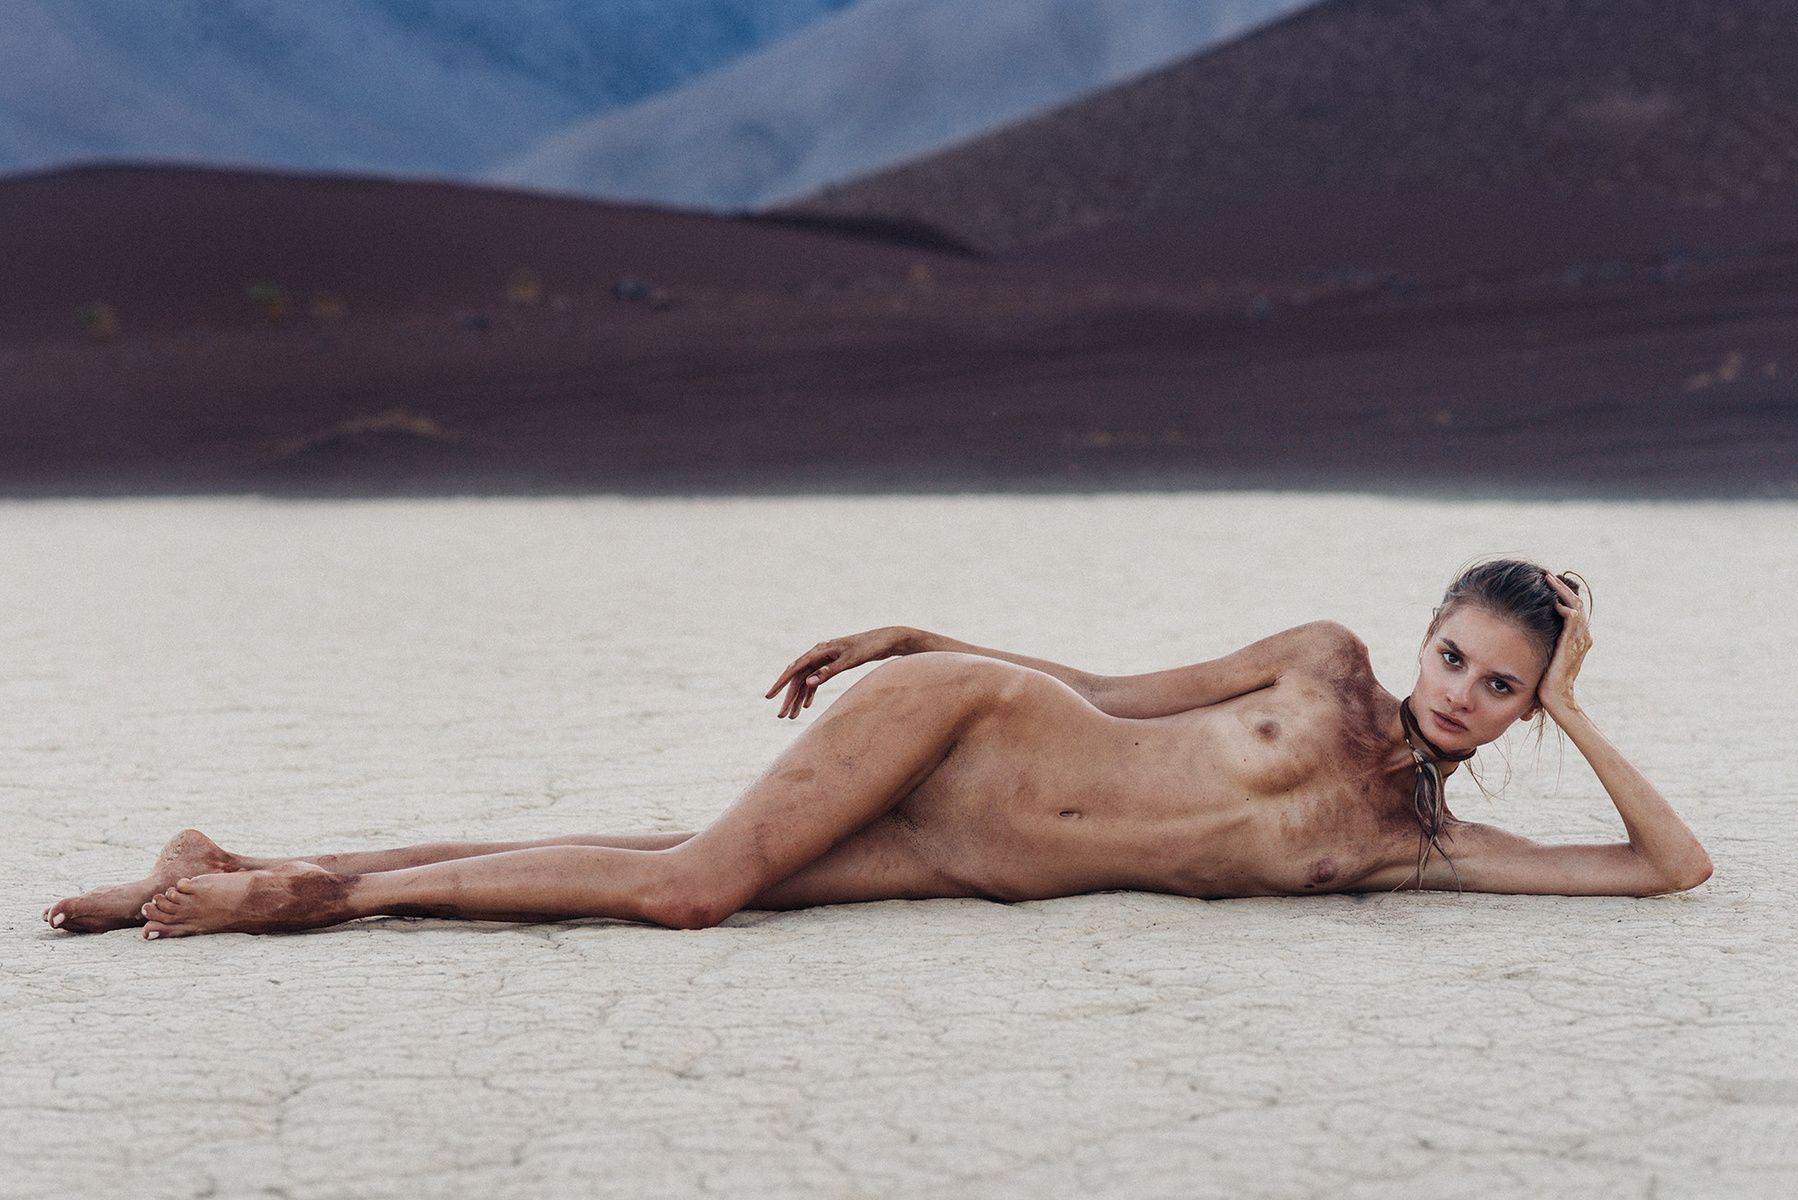 Communication on this topic: Claudia romani in bikini for a photoshoot in miami, kristina-boyko-nude/